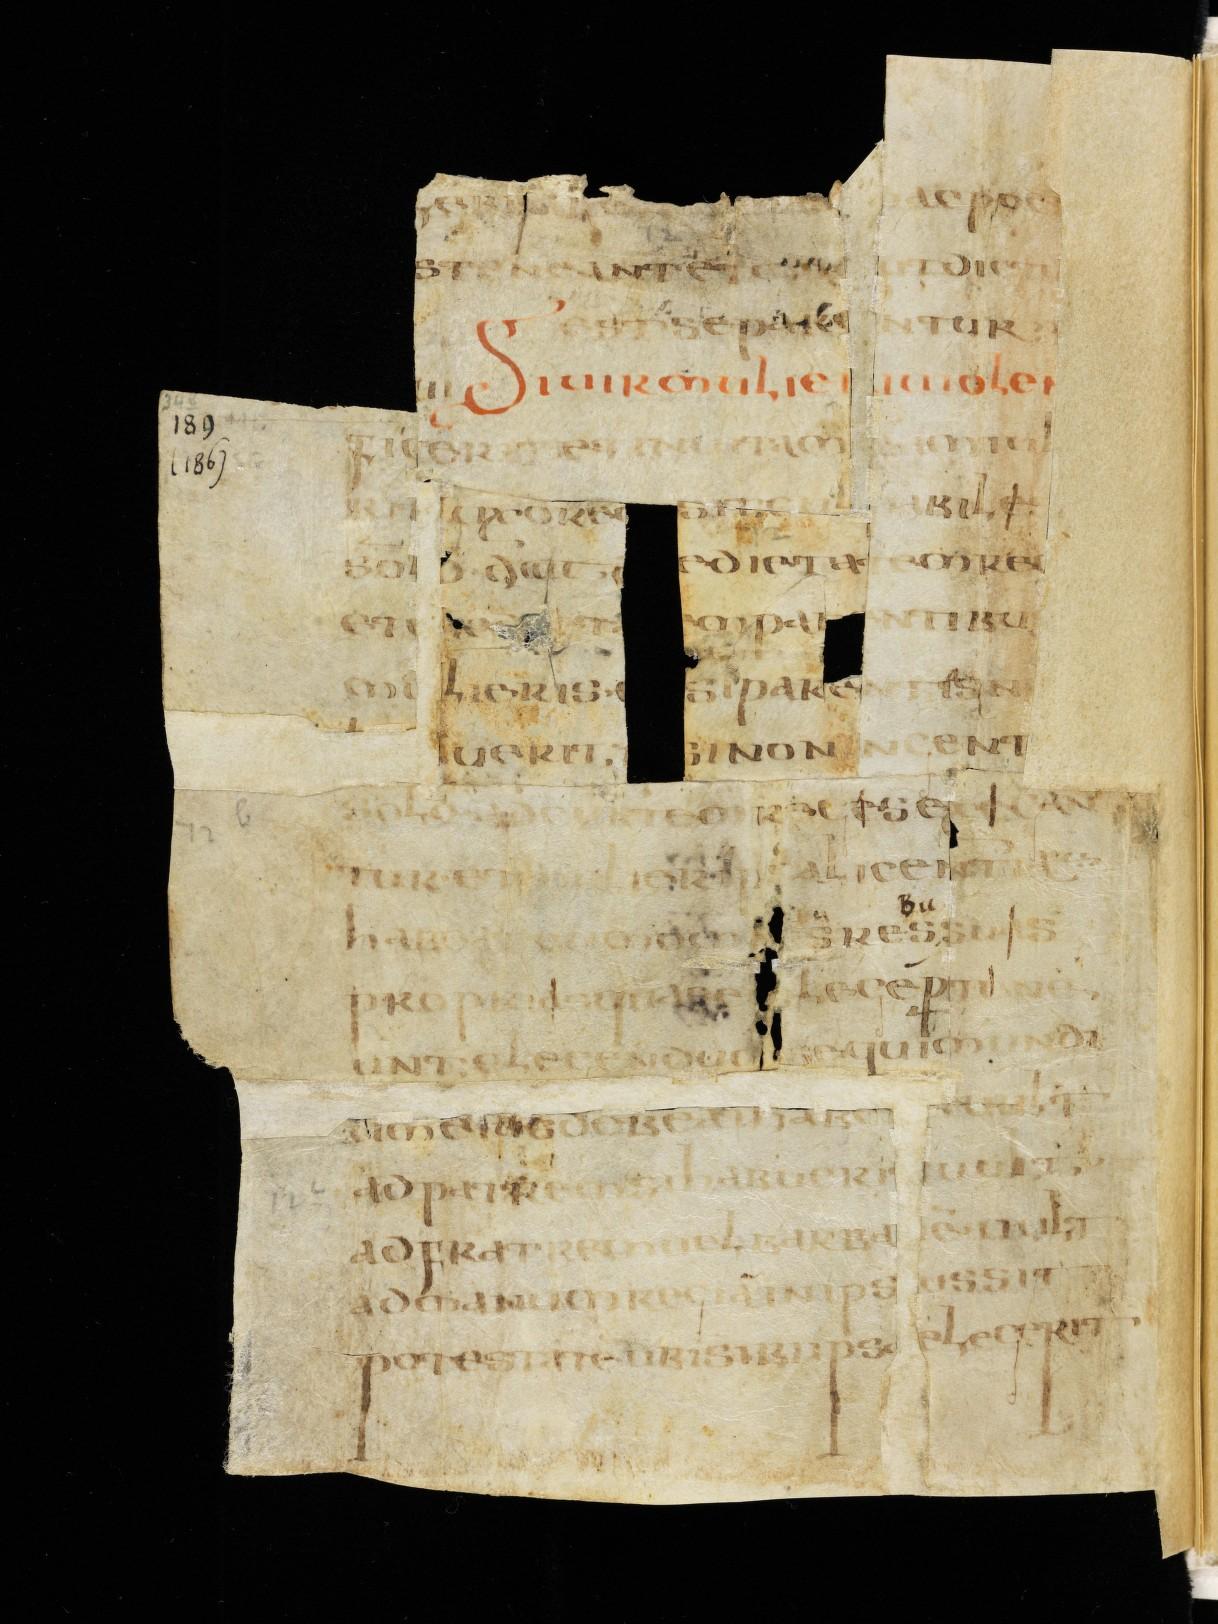 Cod. Sang. 730, p. 34b